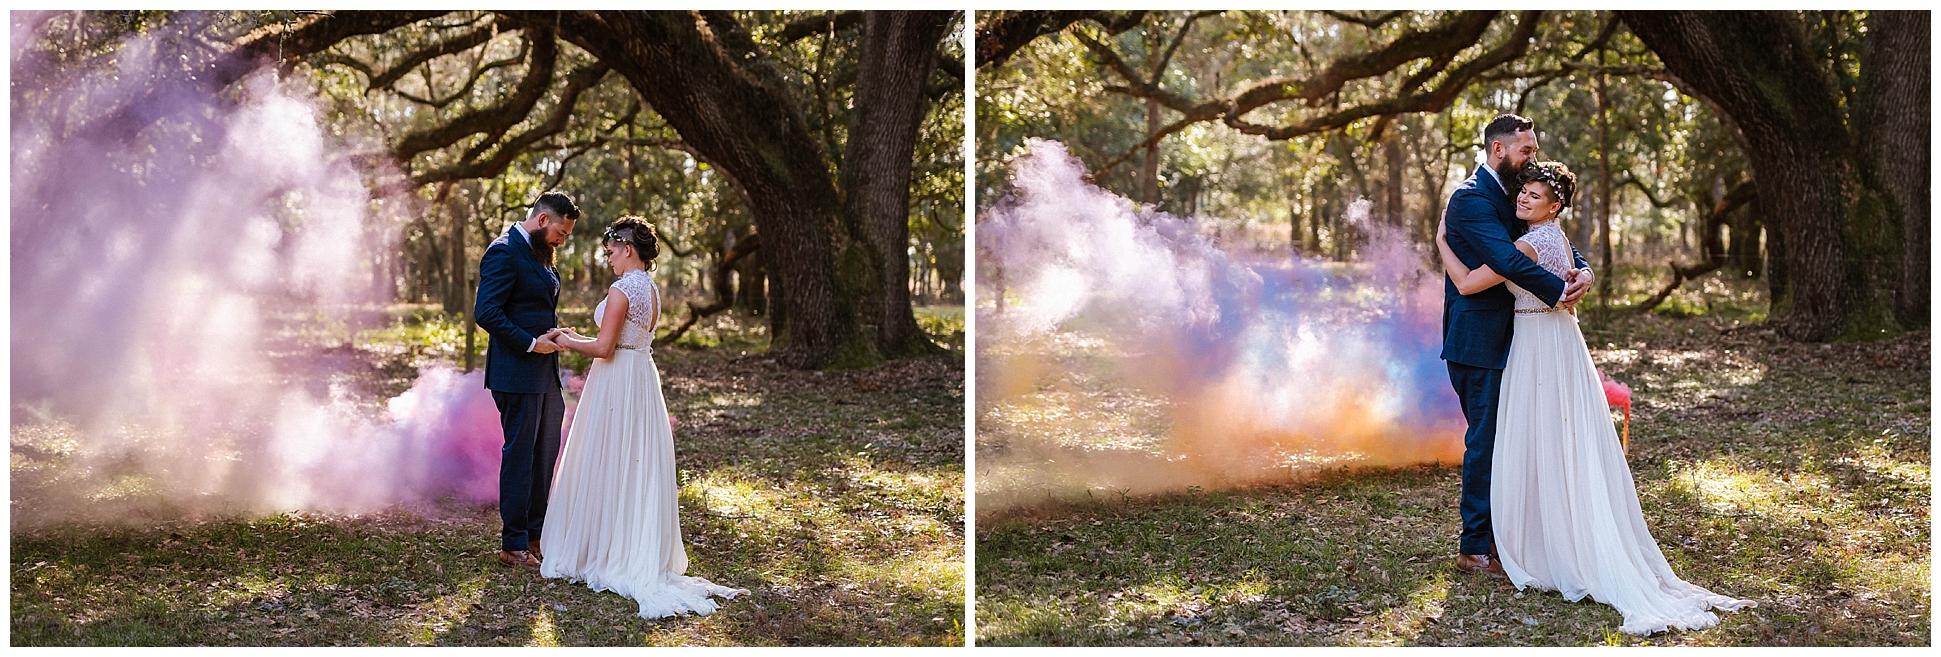 magical-outdoor-florida-wedding-smoke-bombs-flowers-crown-beard_0013.jpg